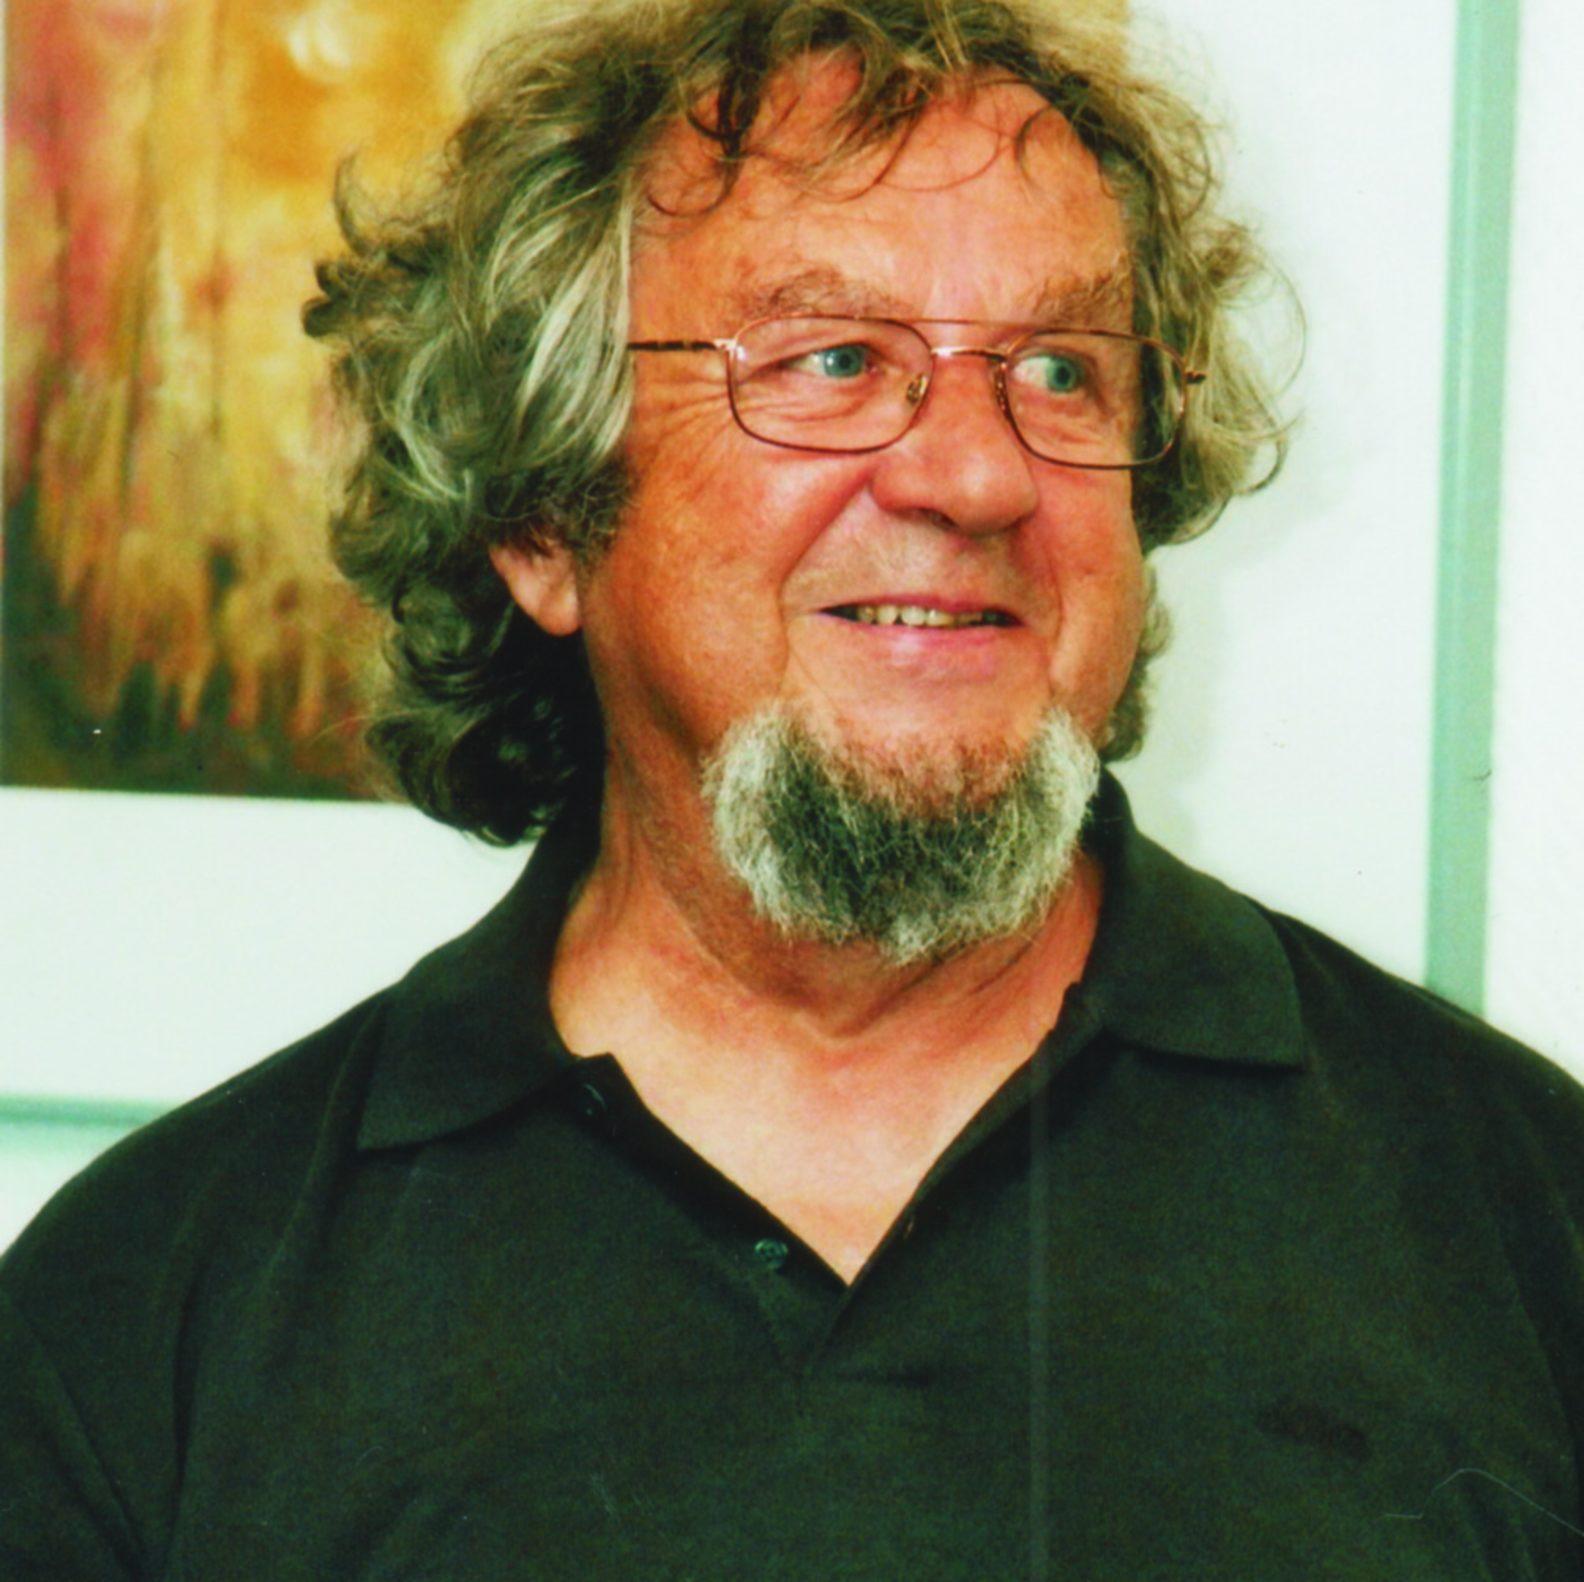 Karl-Heinz Thoma